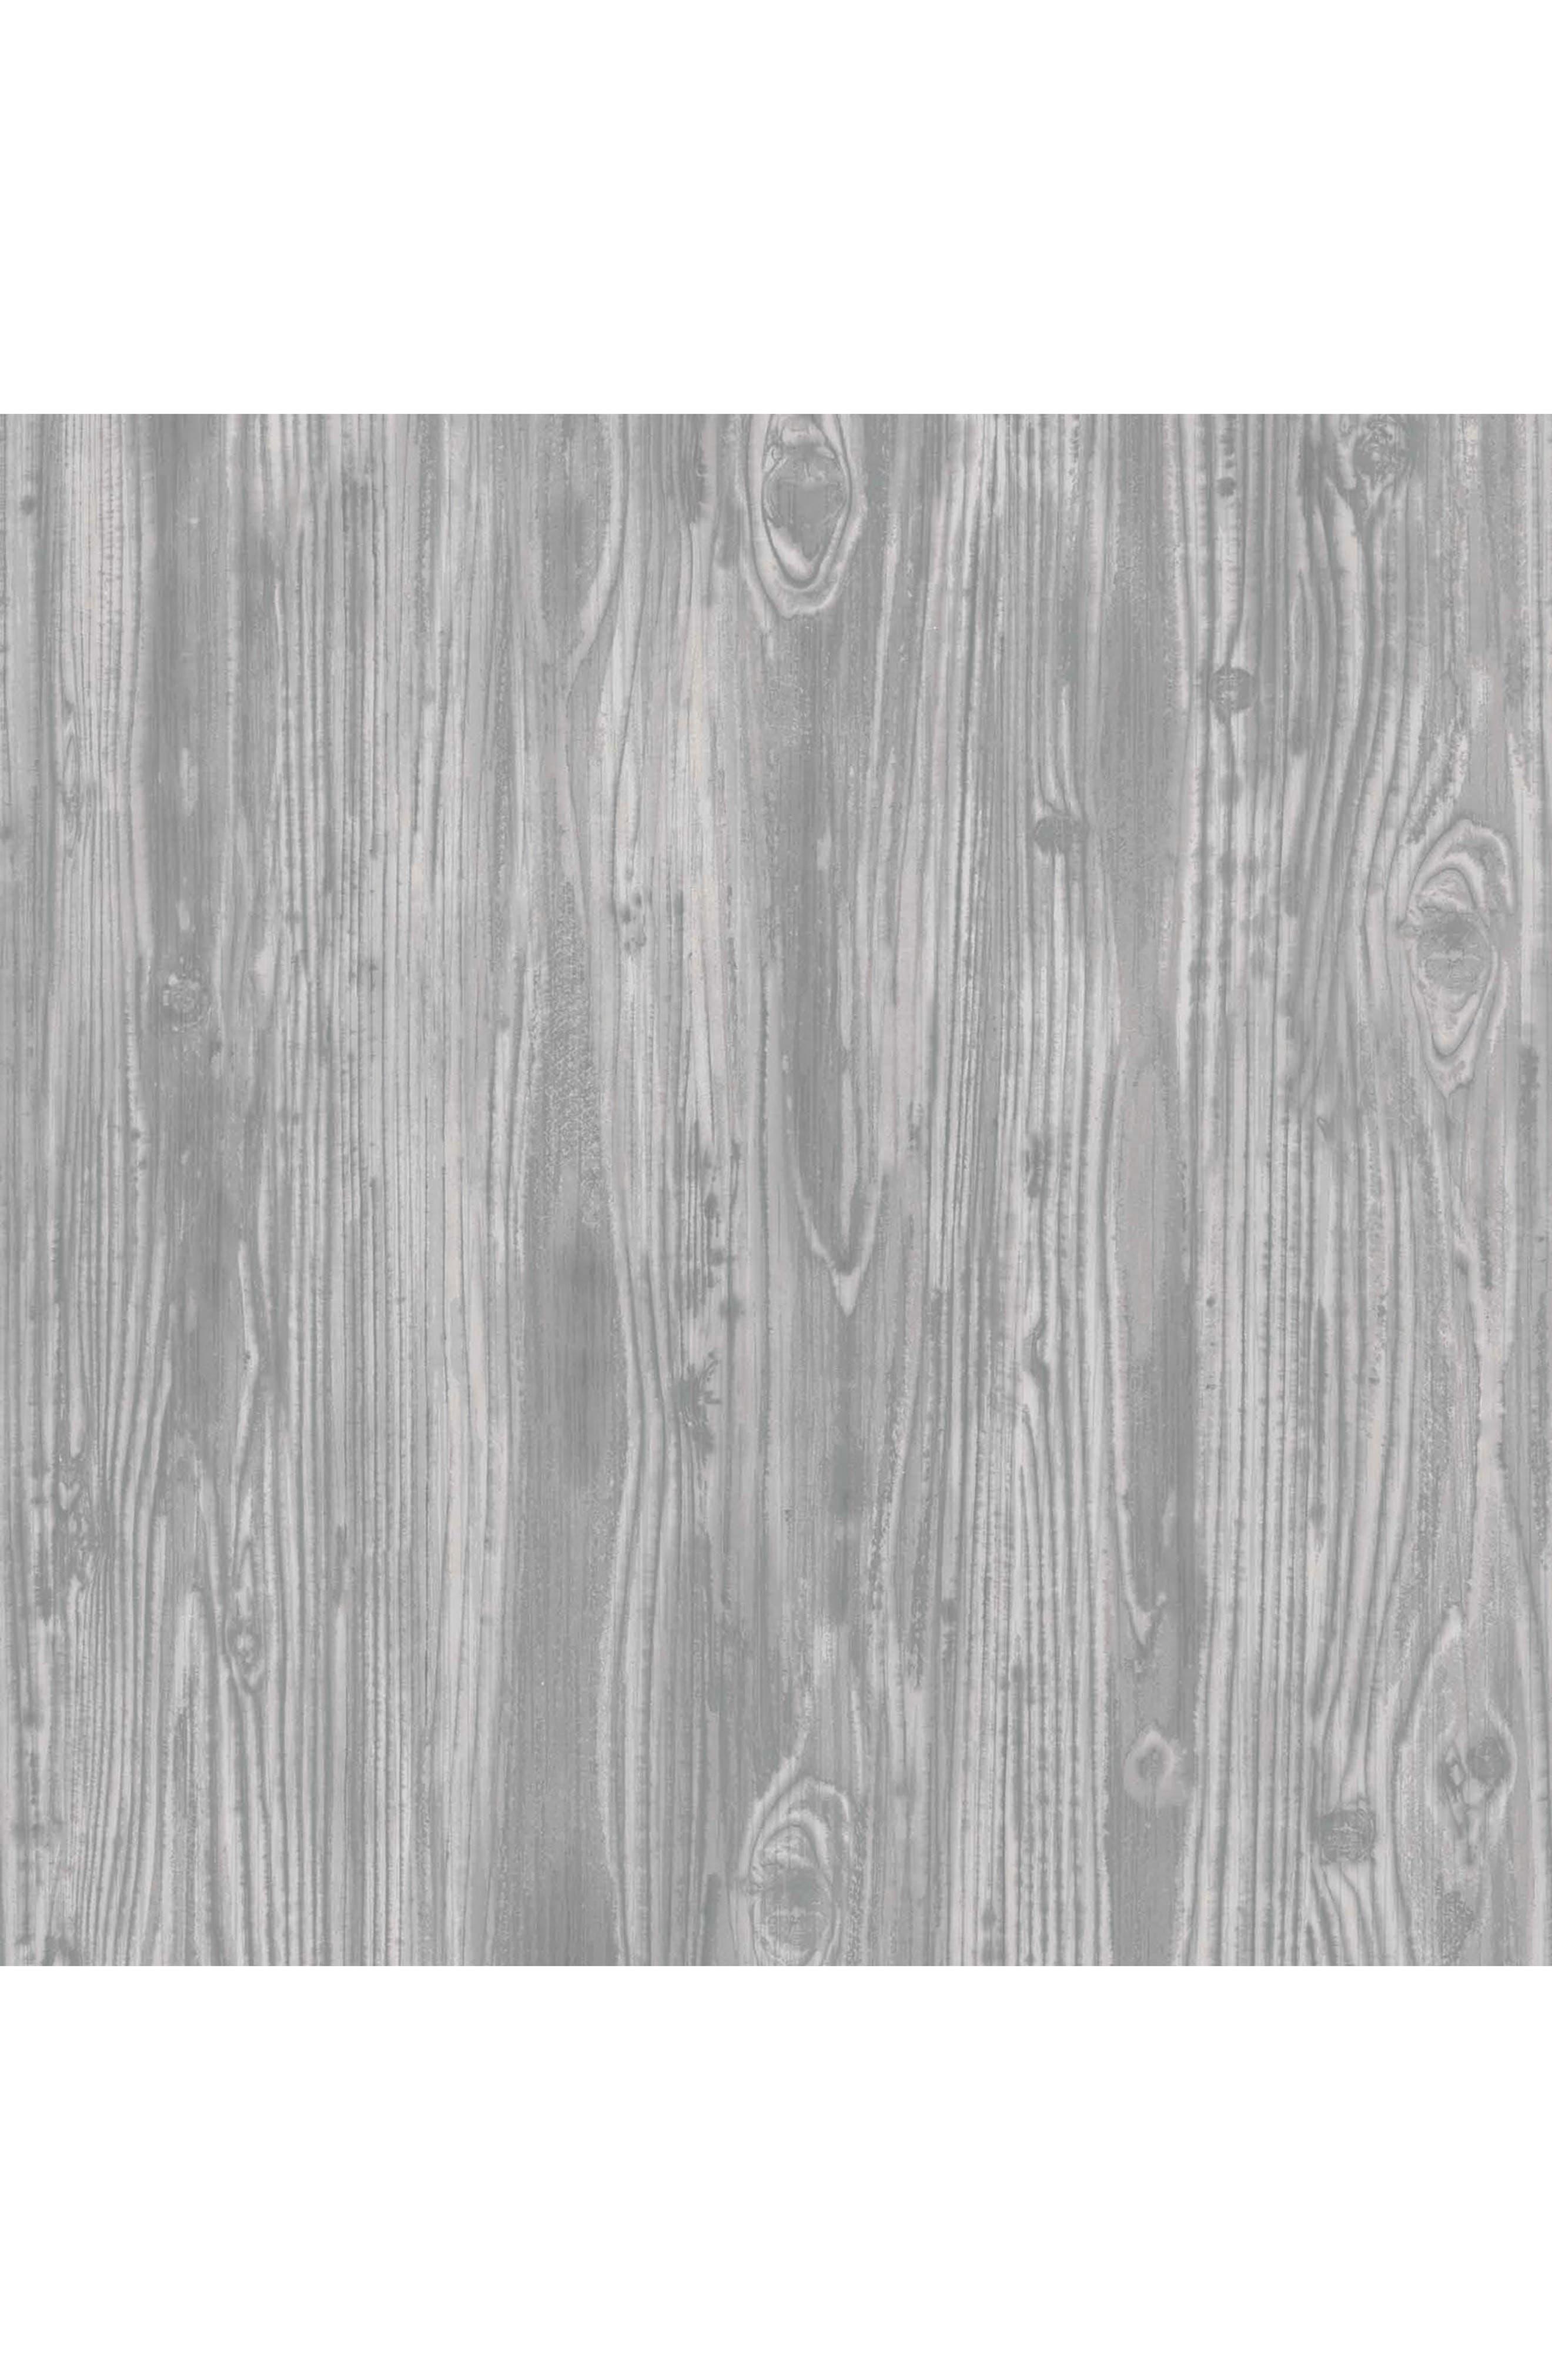 Woodgrain Self-Adhesive Vinyl Wallpaper,                             Main thumbnail 1, color,                             020